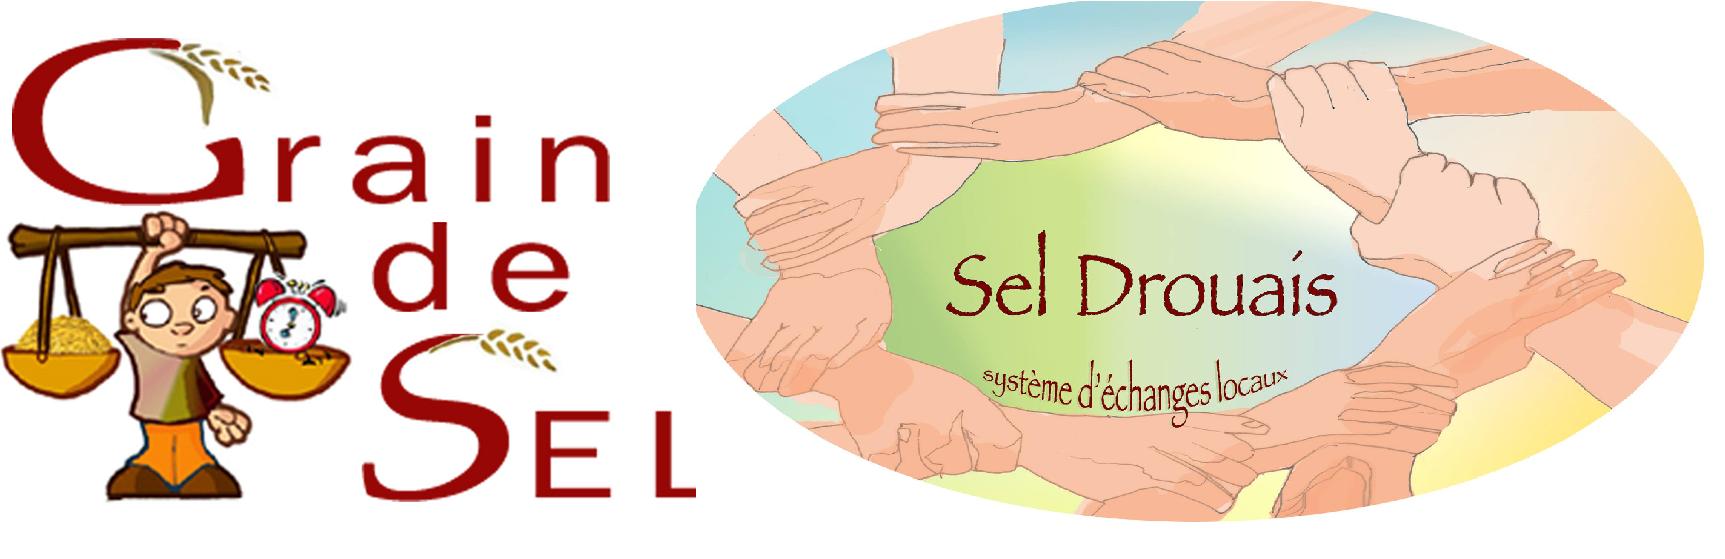 grain2SEL / SEL Drouais